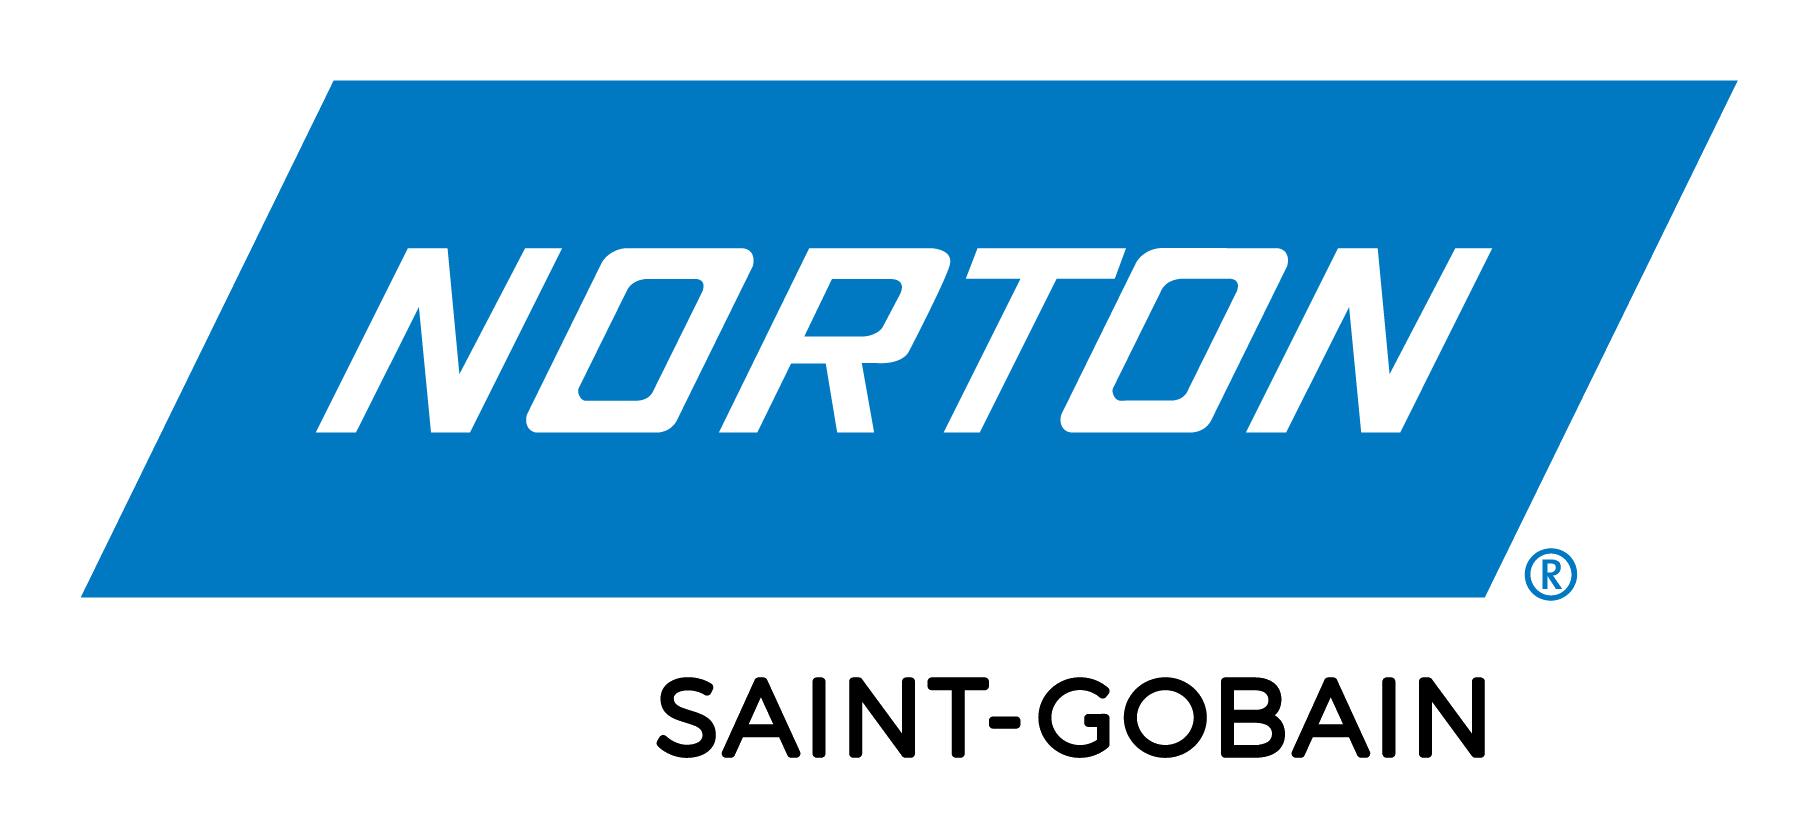 SG_Norton_logo_rgb_15